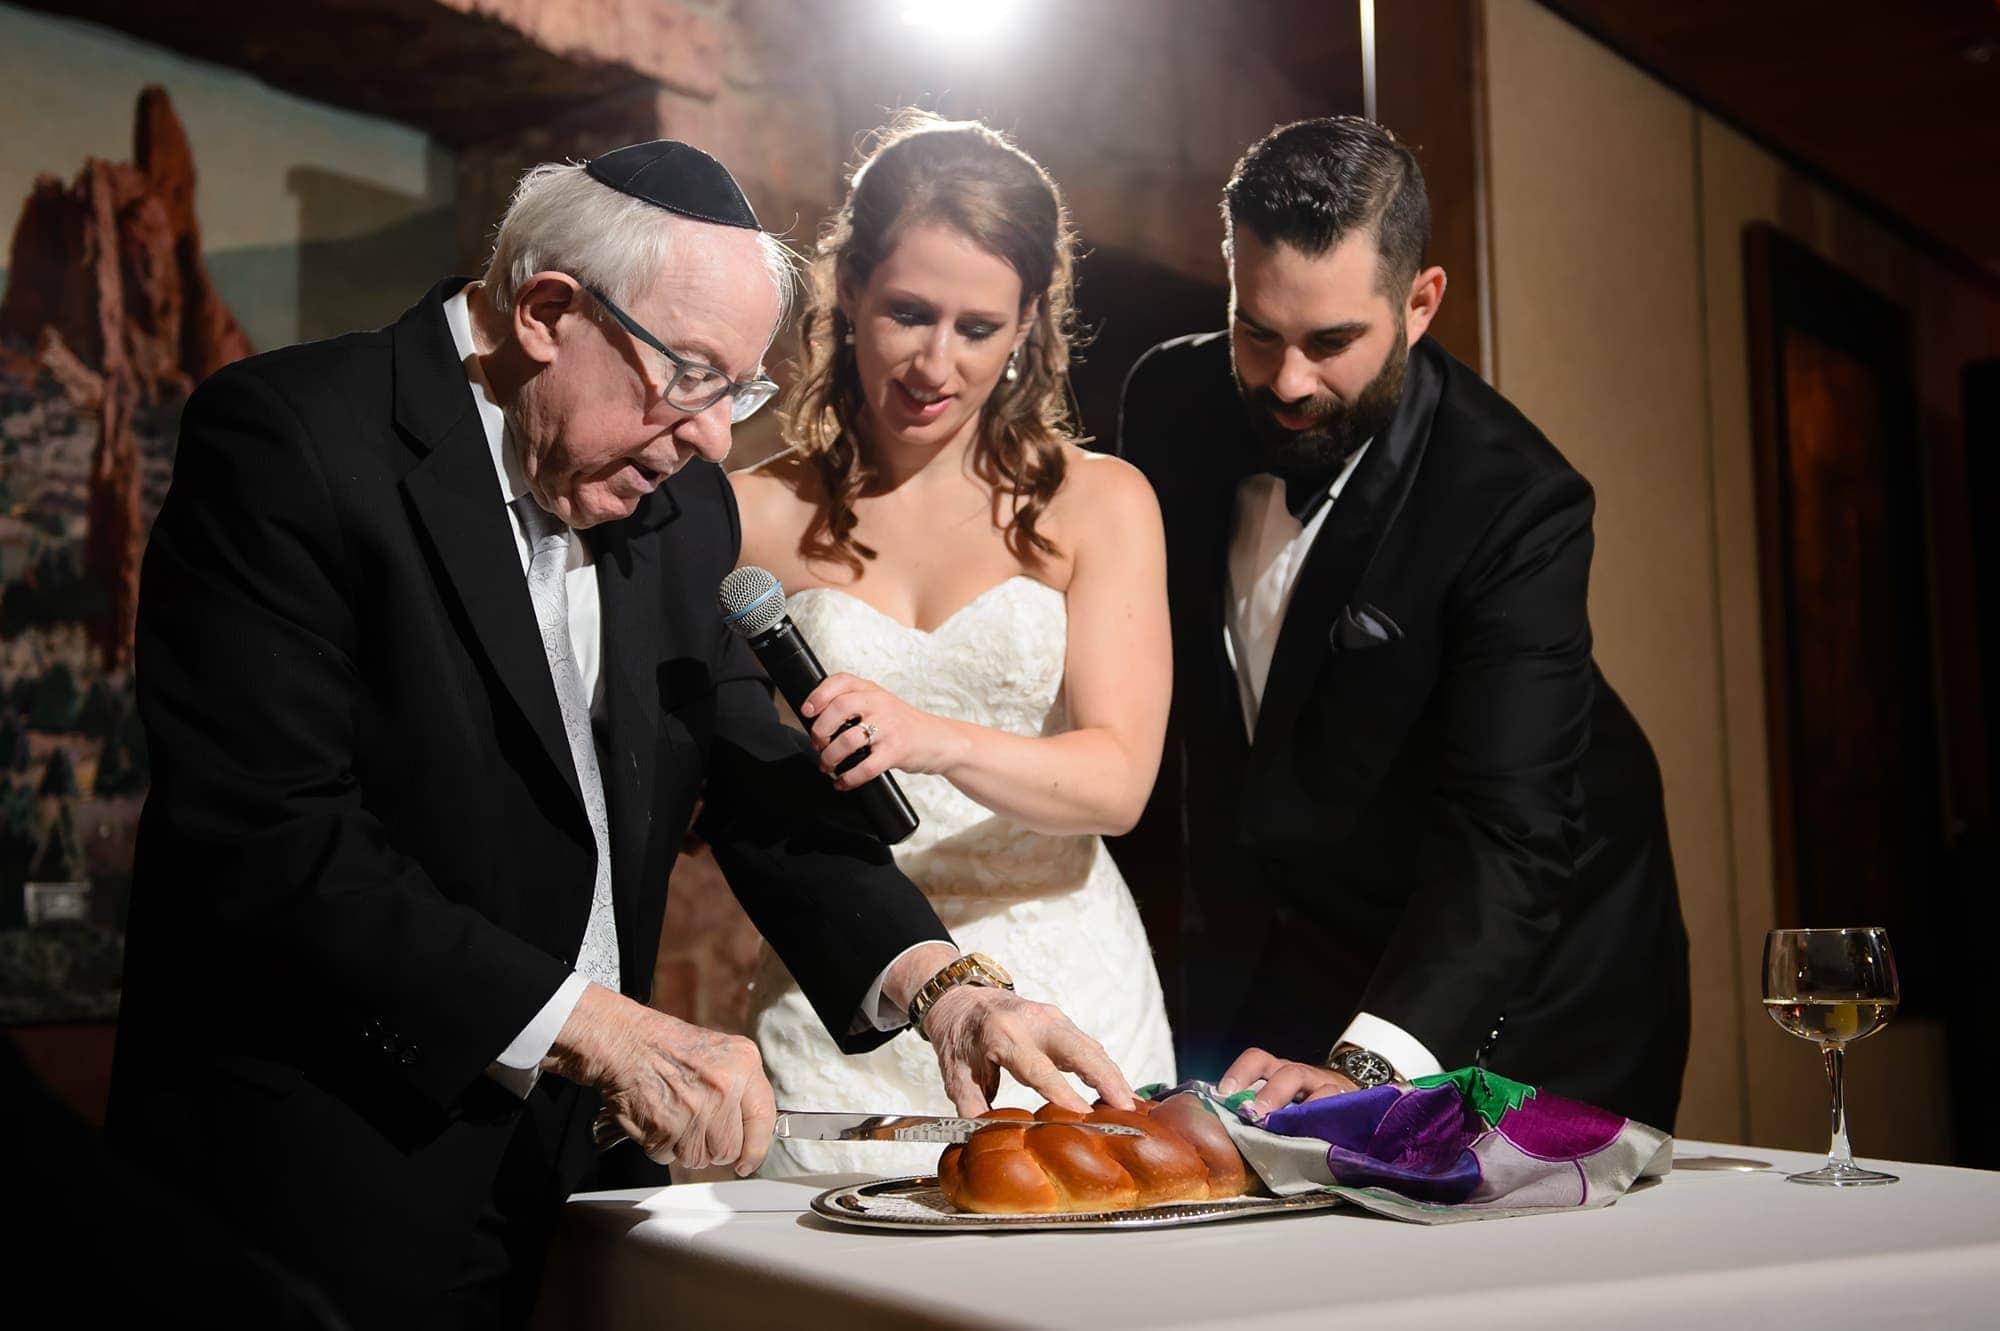 Devan's grandfather cuts the challah